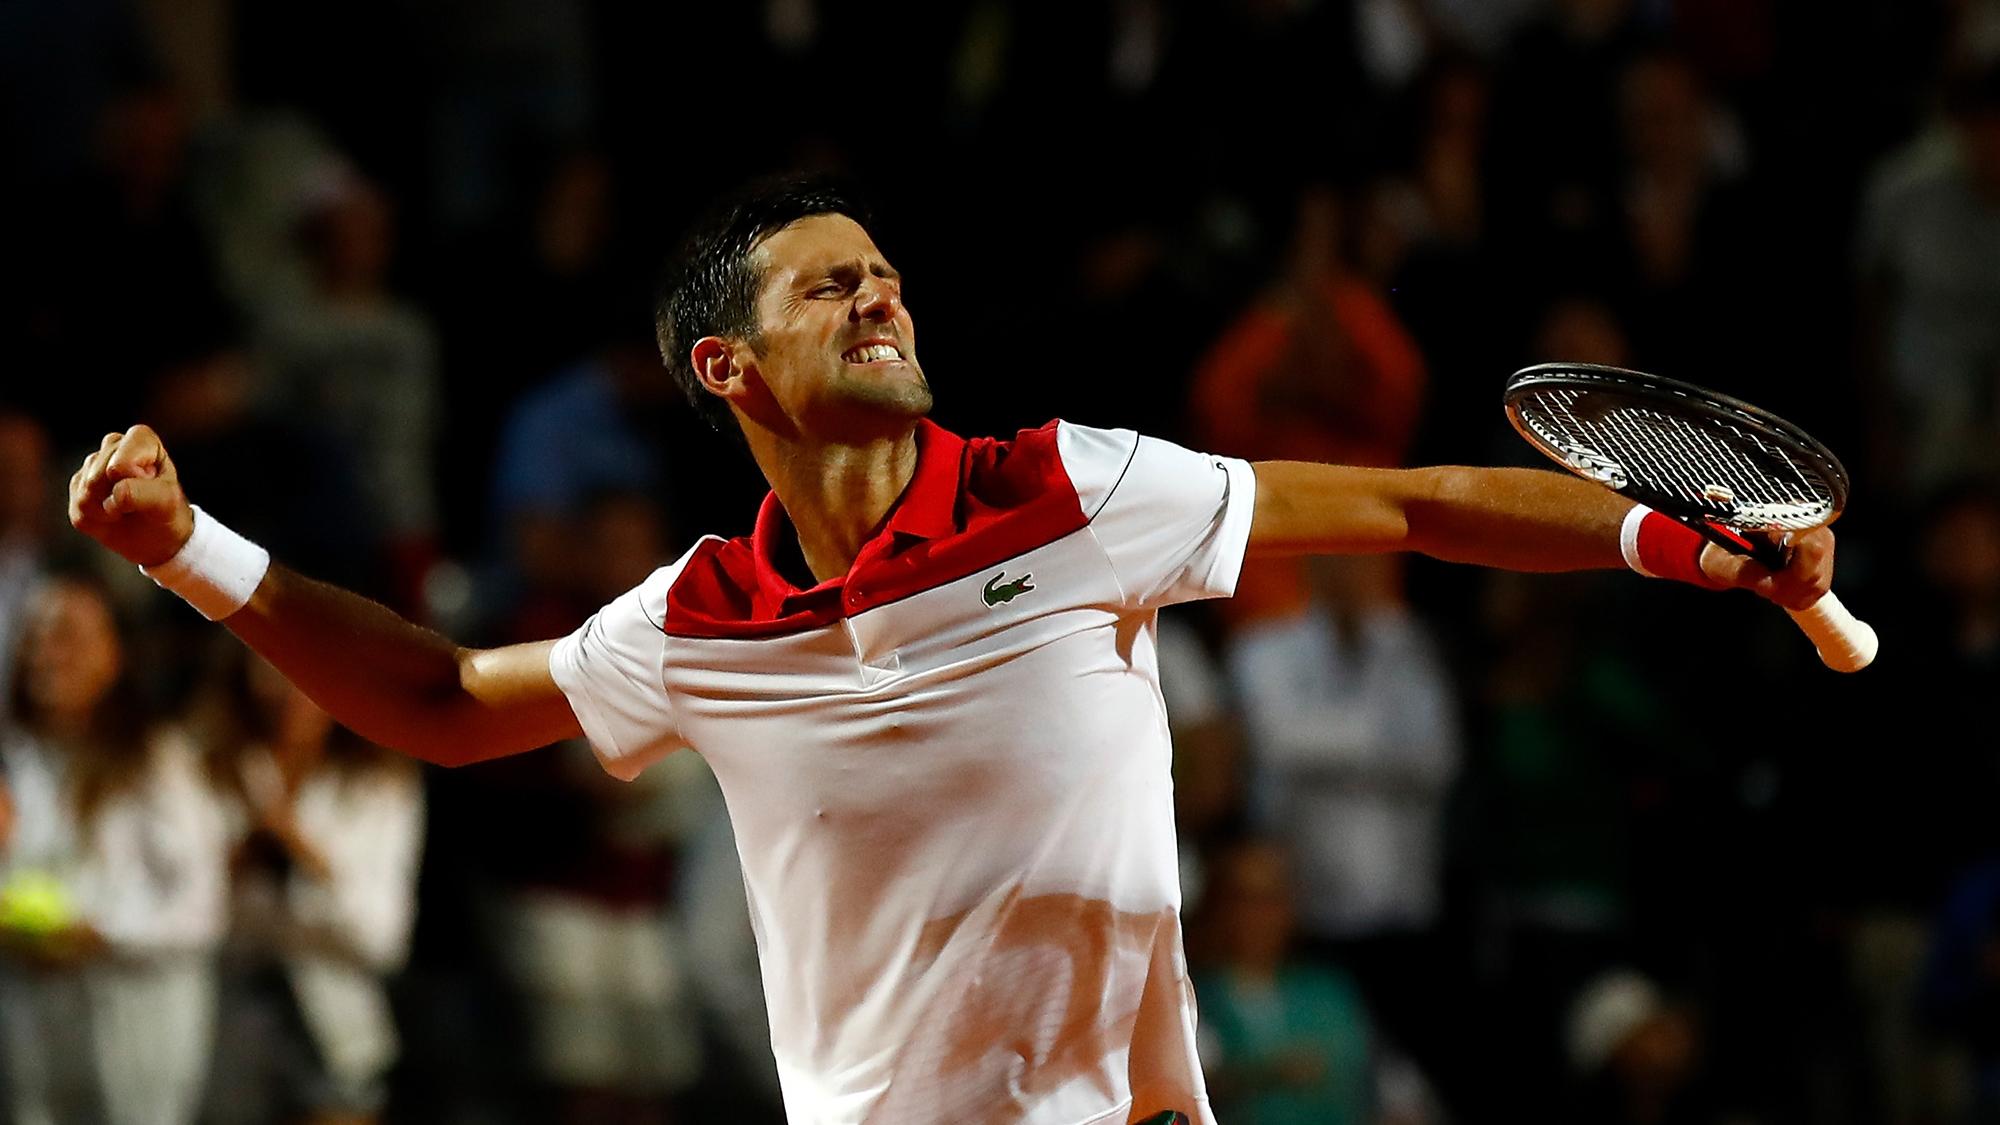 Rafa Nadal Fabio Fognini Novak Djokovic Rome Italian Open ATP Tennis